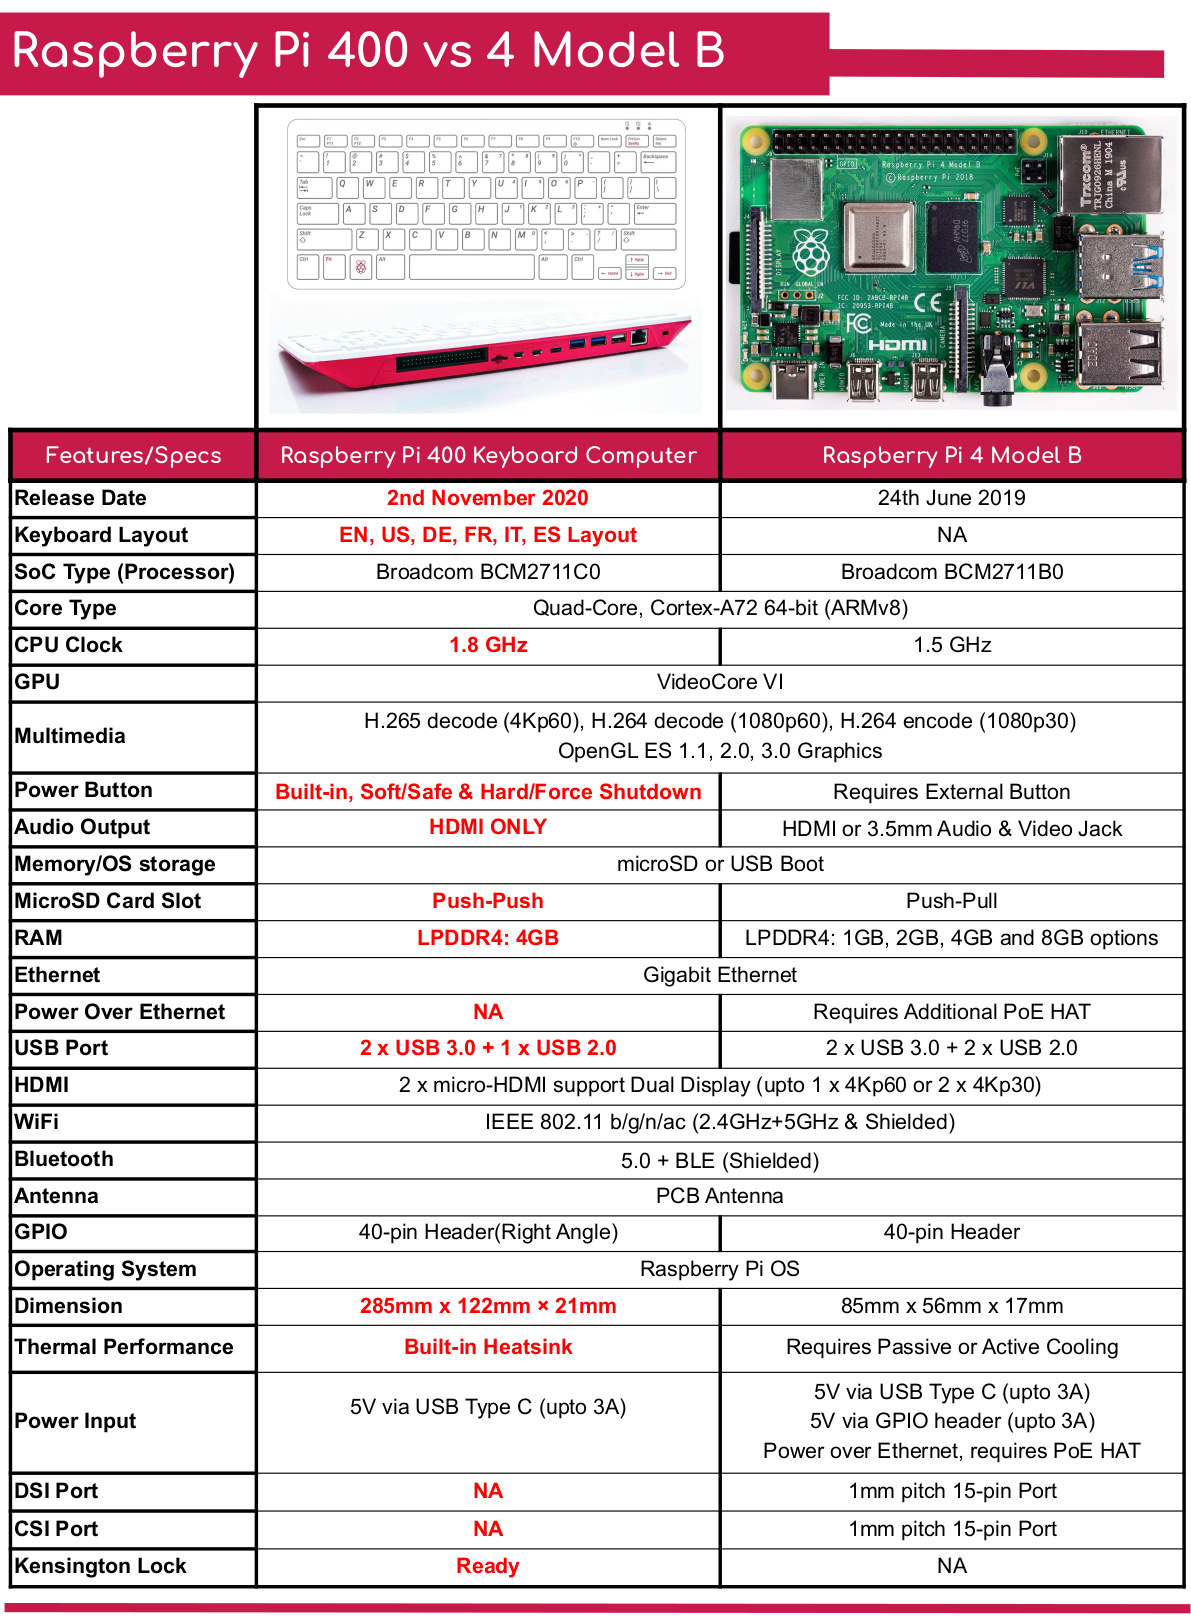 Raspberry Pi 400 vs Raspberry Pi 4 Model B